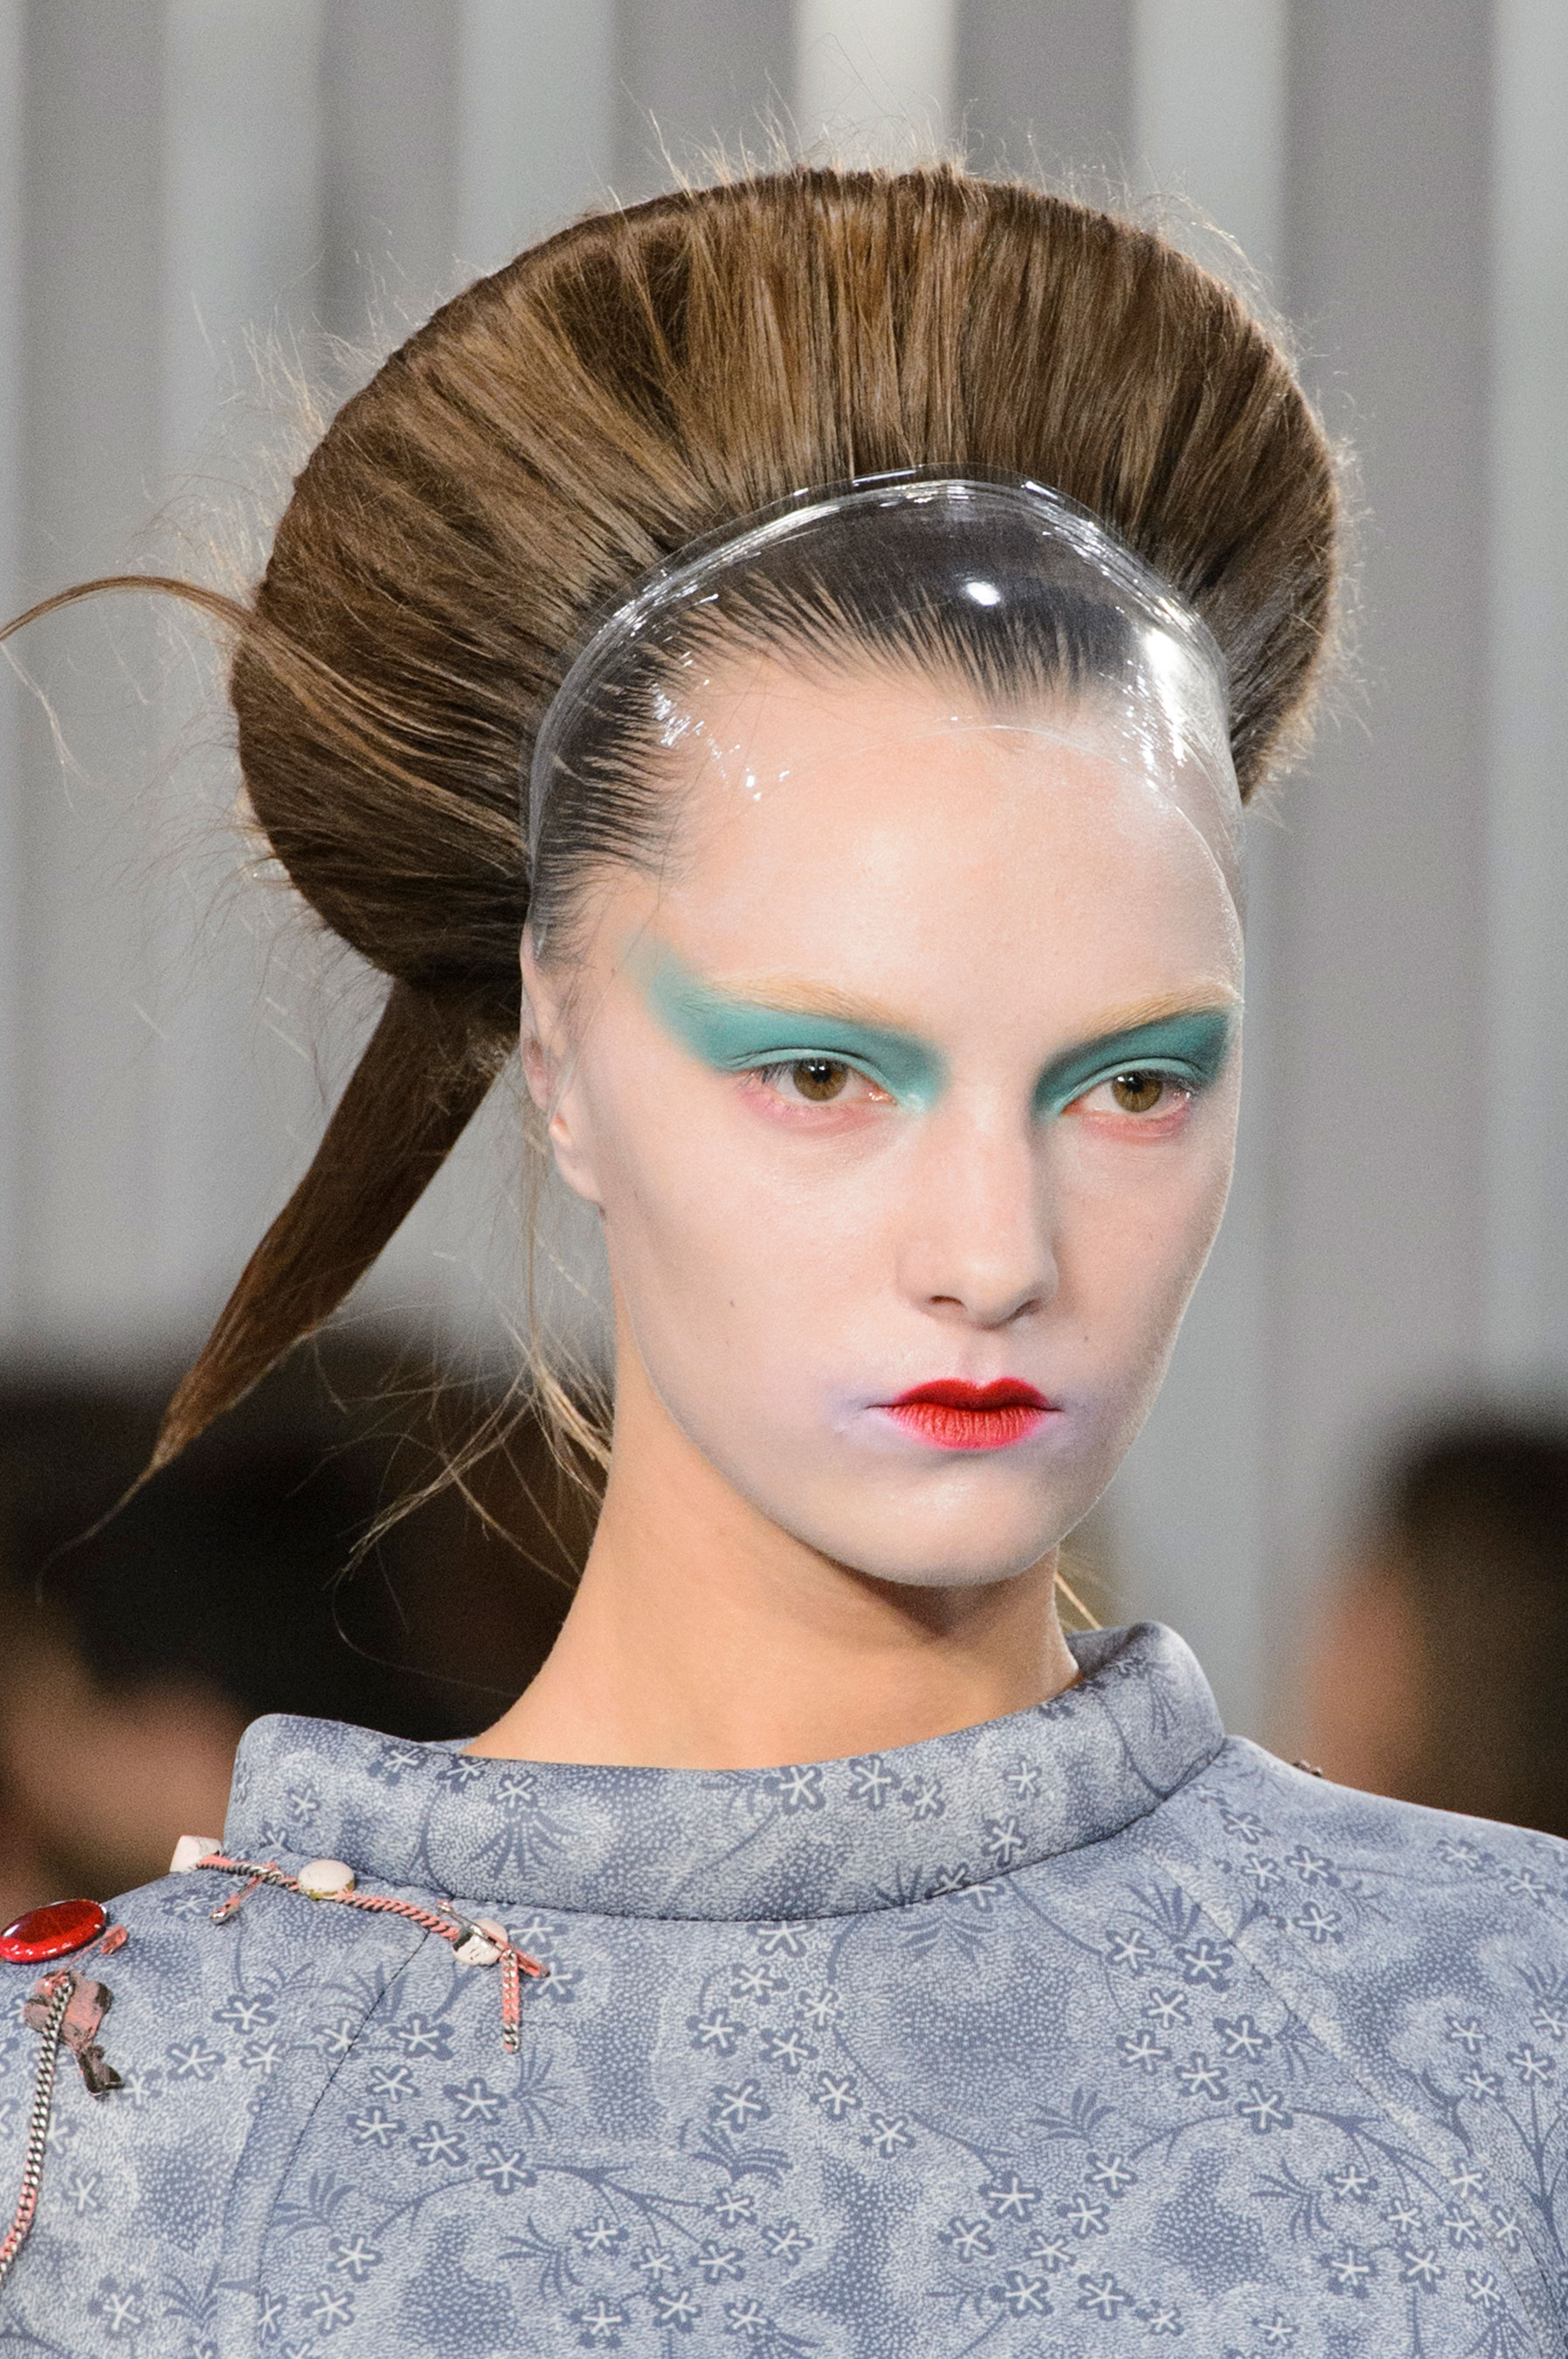 Maison-Margiela-spring-2016-runway-beauty-fashion-show-the-impression-018